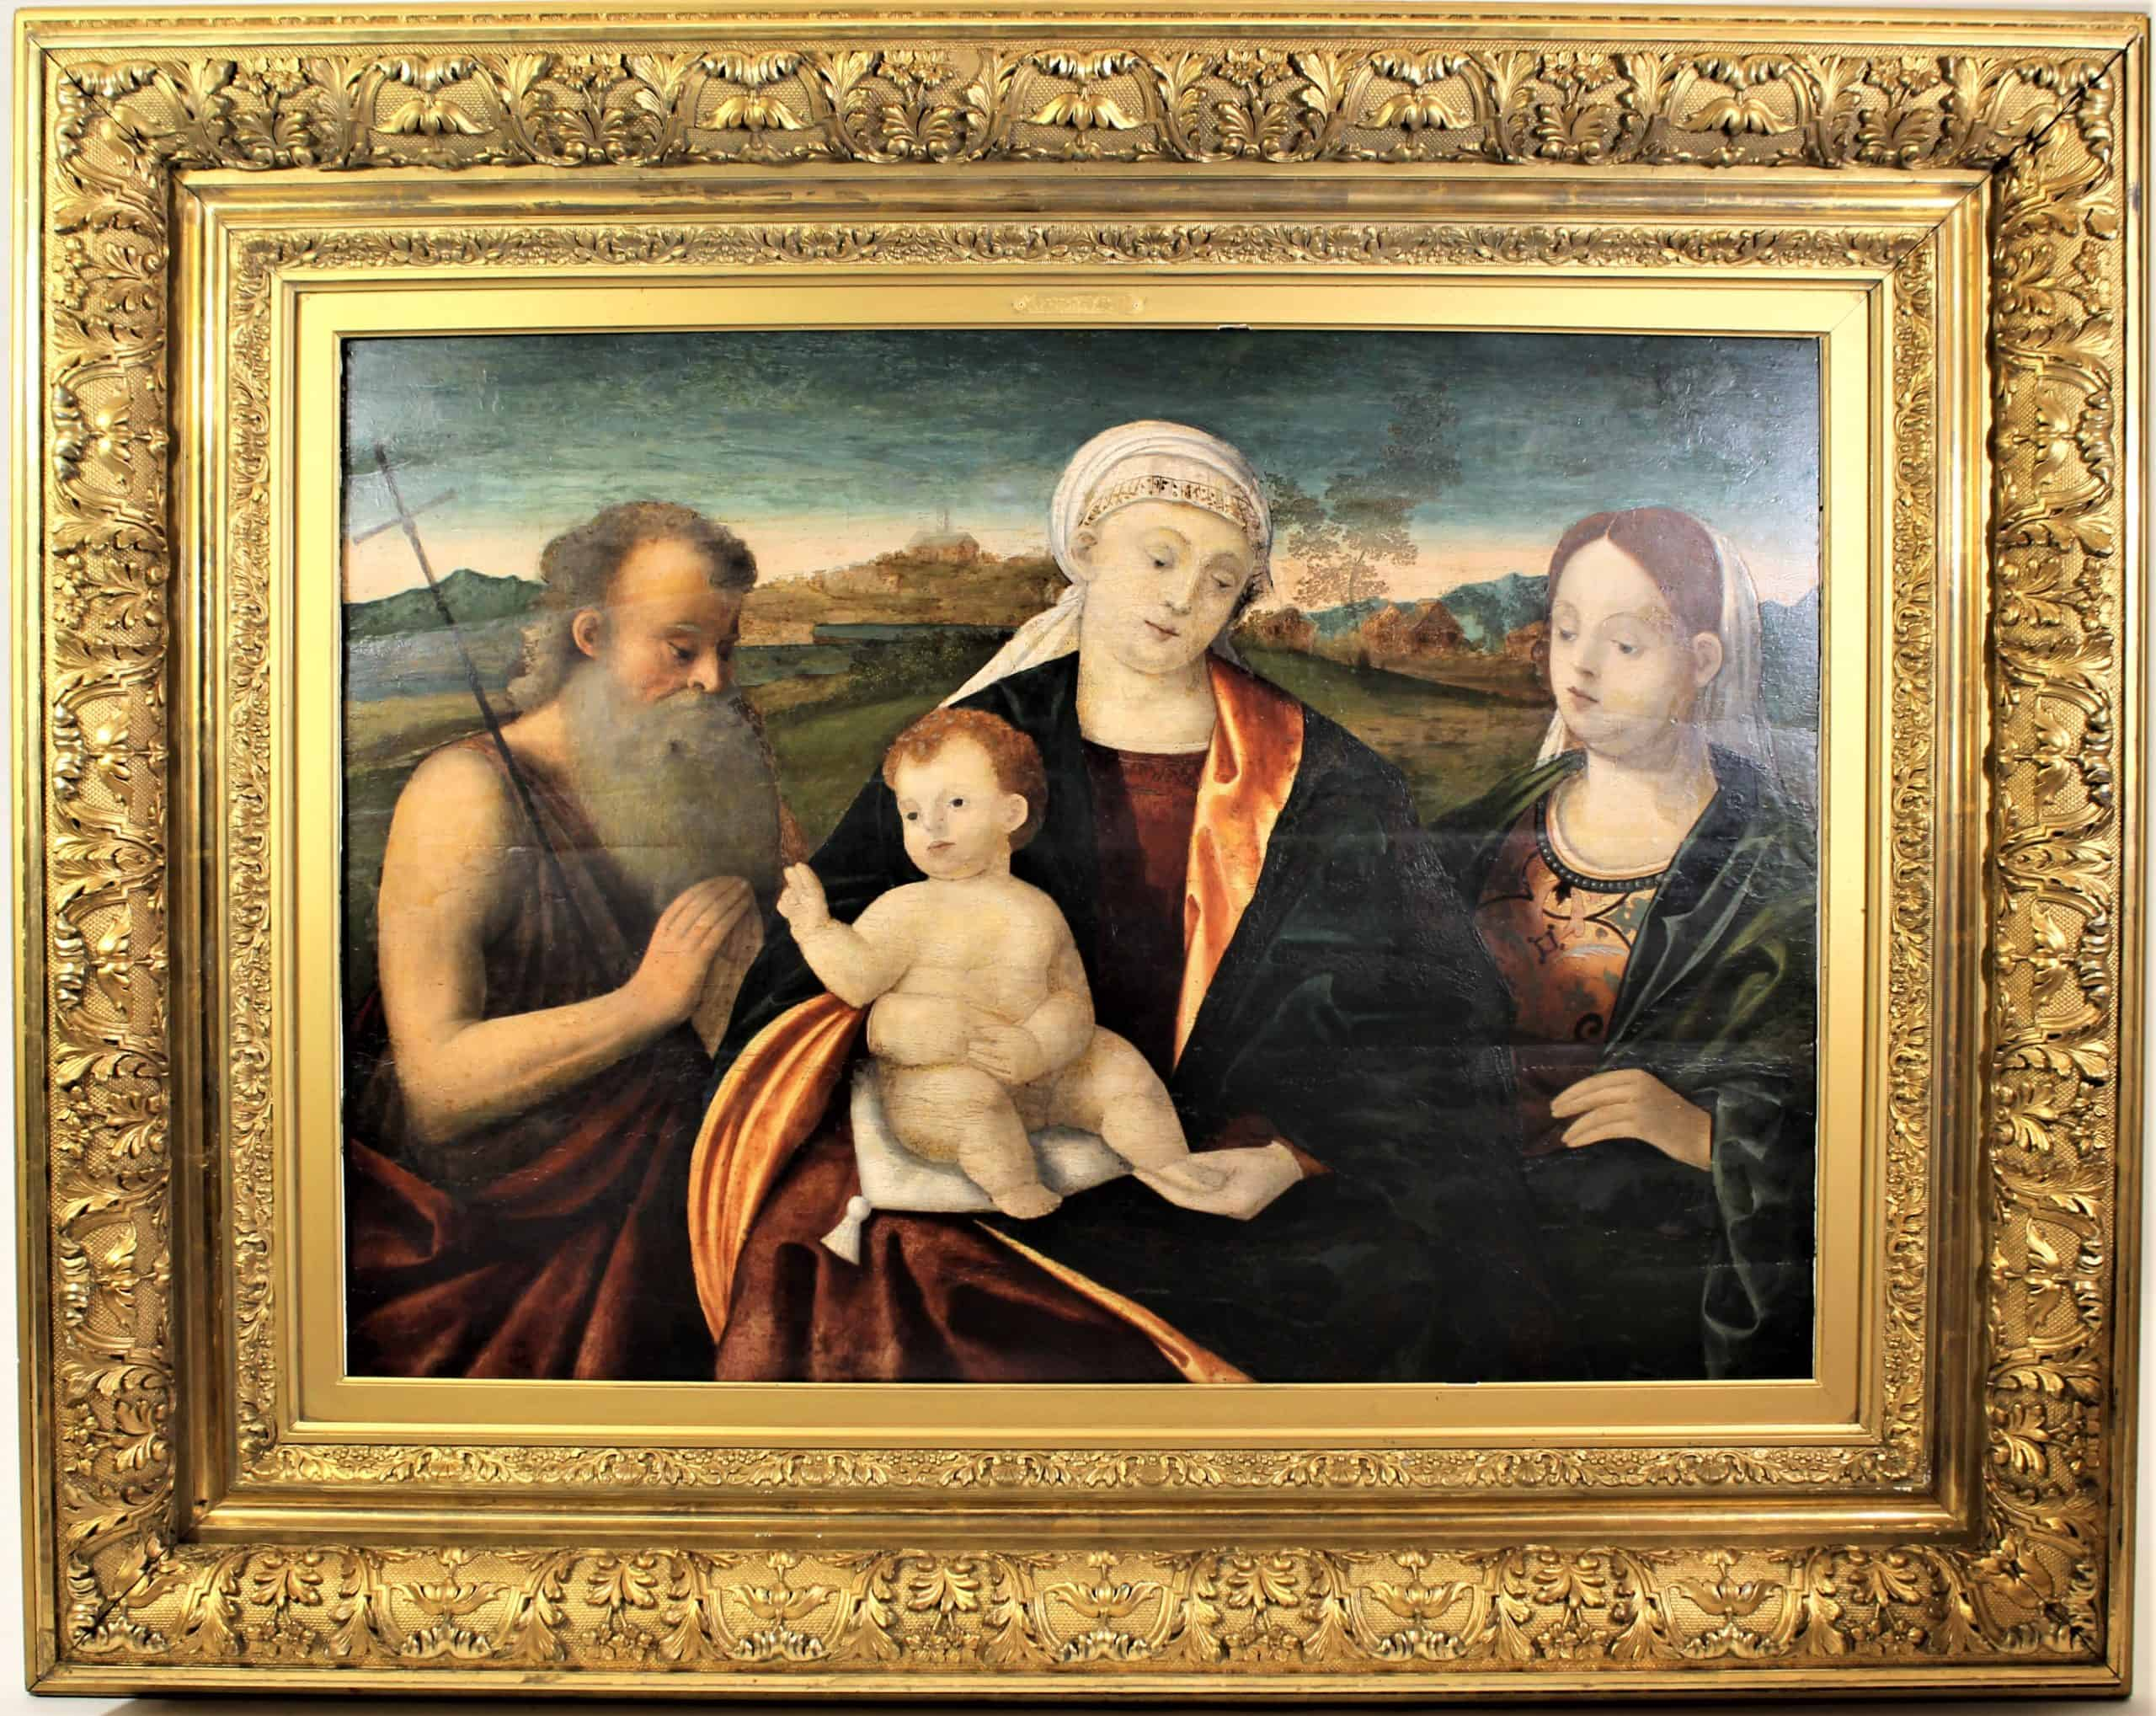 16th C. Venetian School. Manner of Jacopo Tintoretto